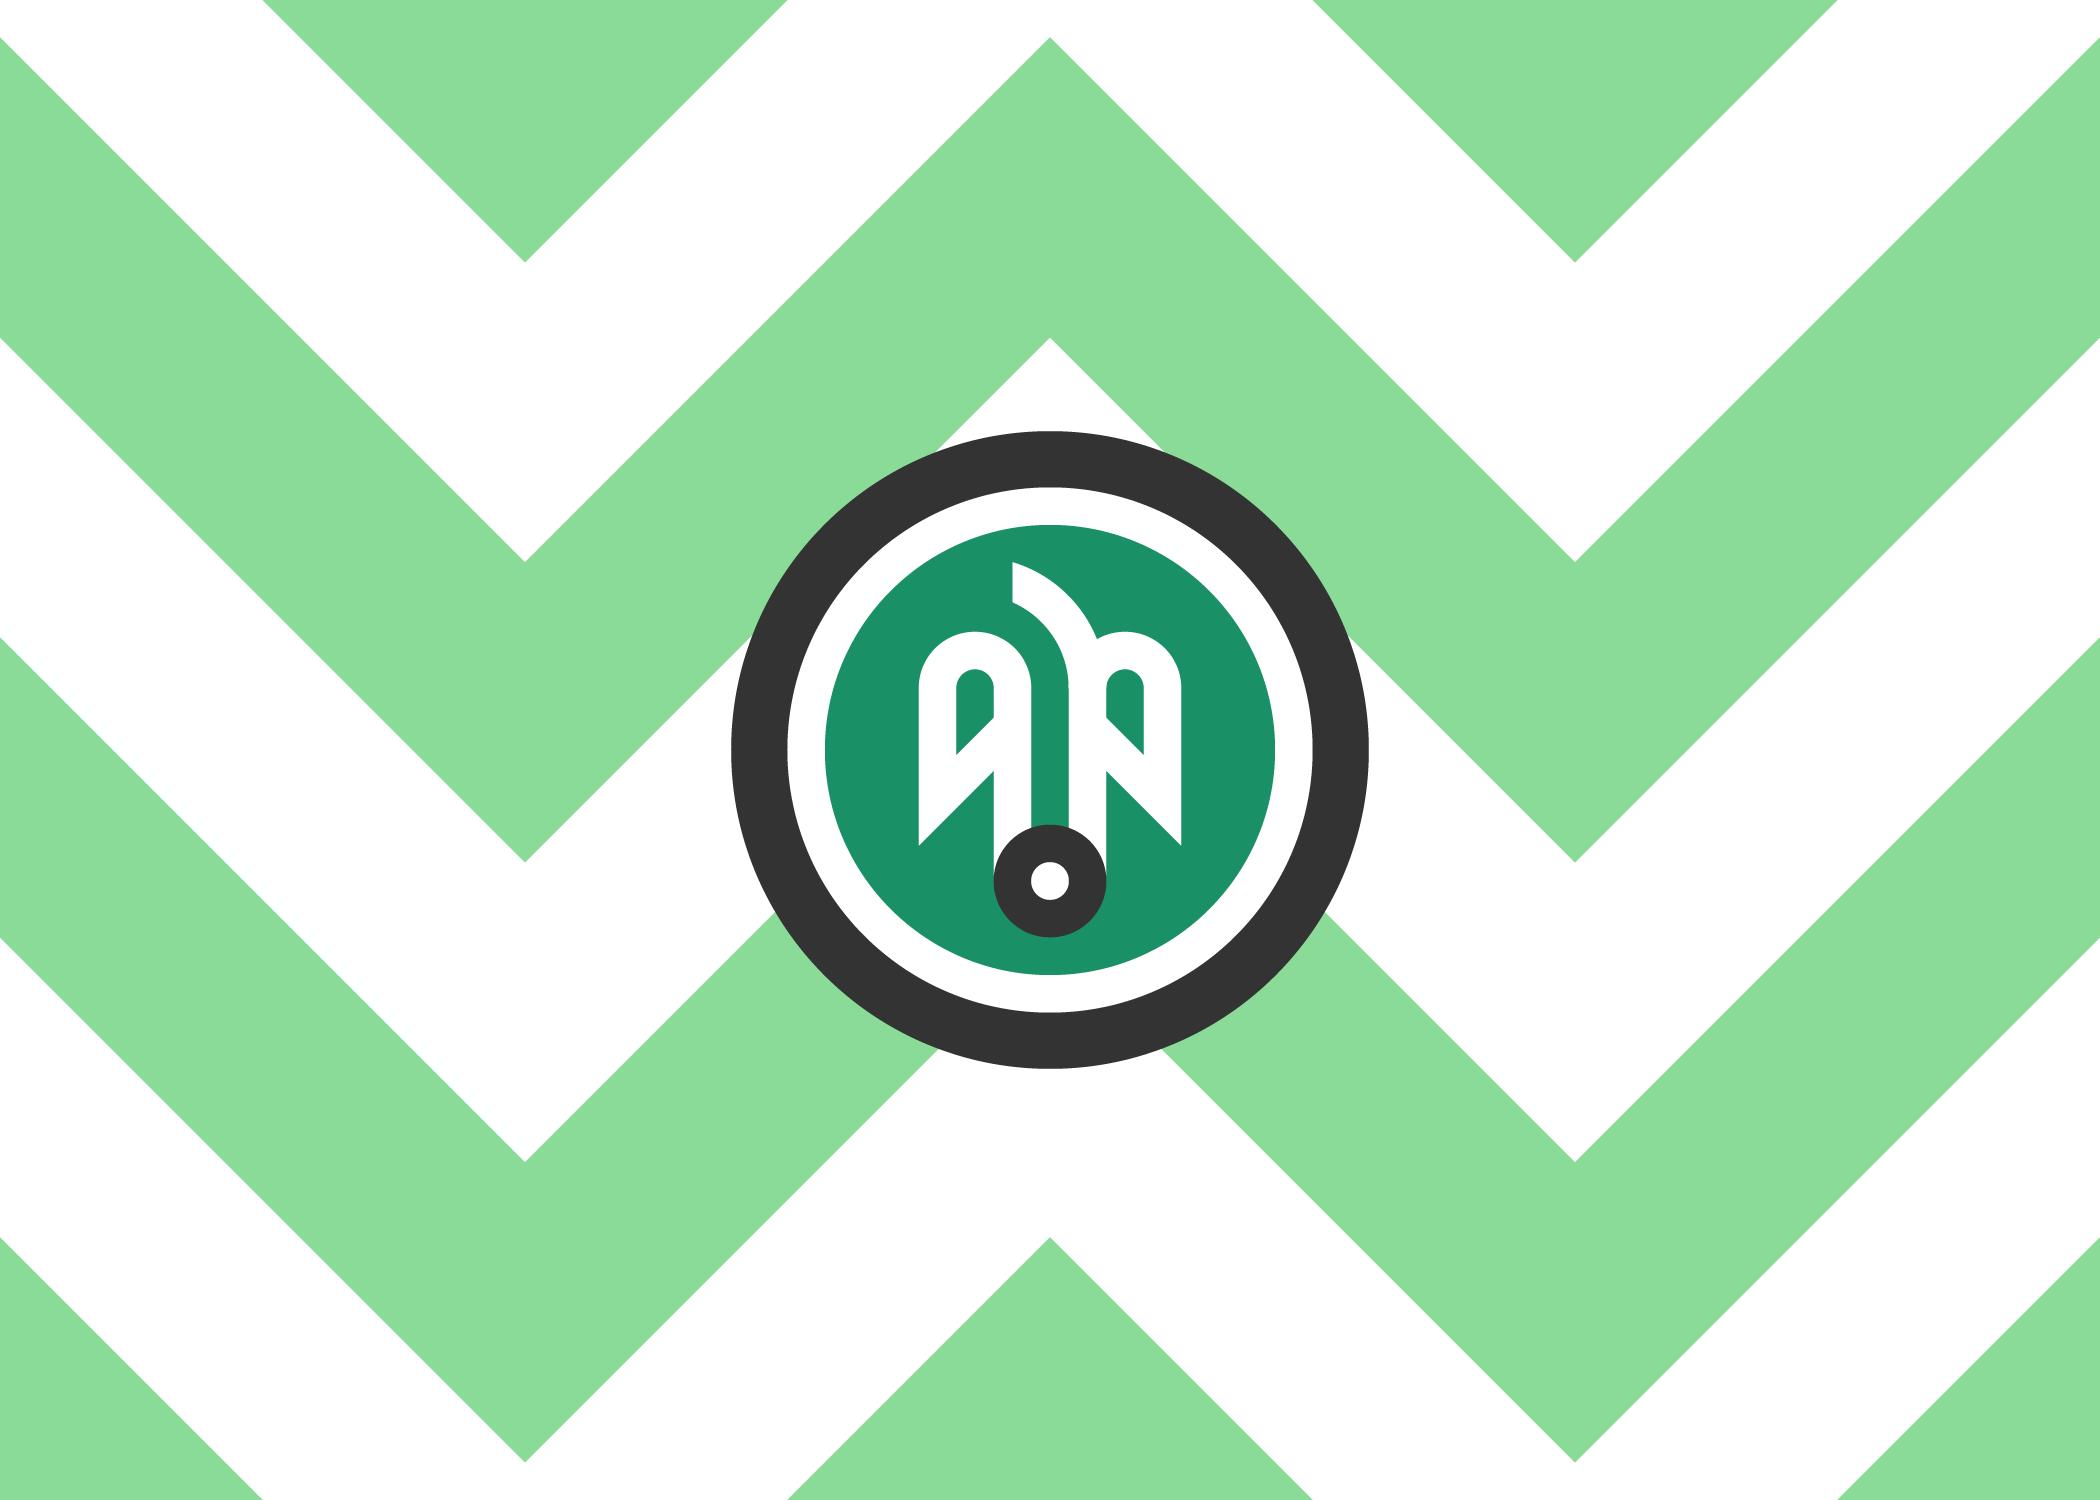 Nigeria-Geometric-World-Cup-Football-Badge-01-Logo-Design-Freelance-Kent.png